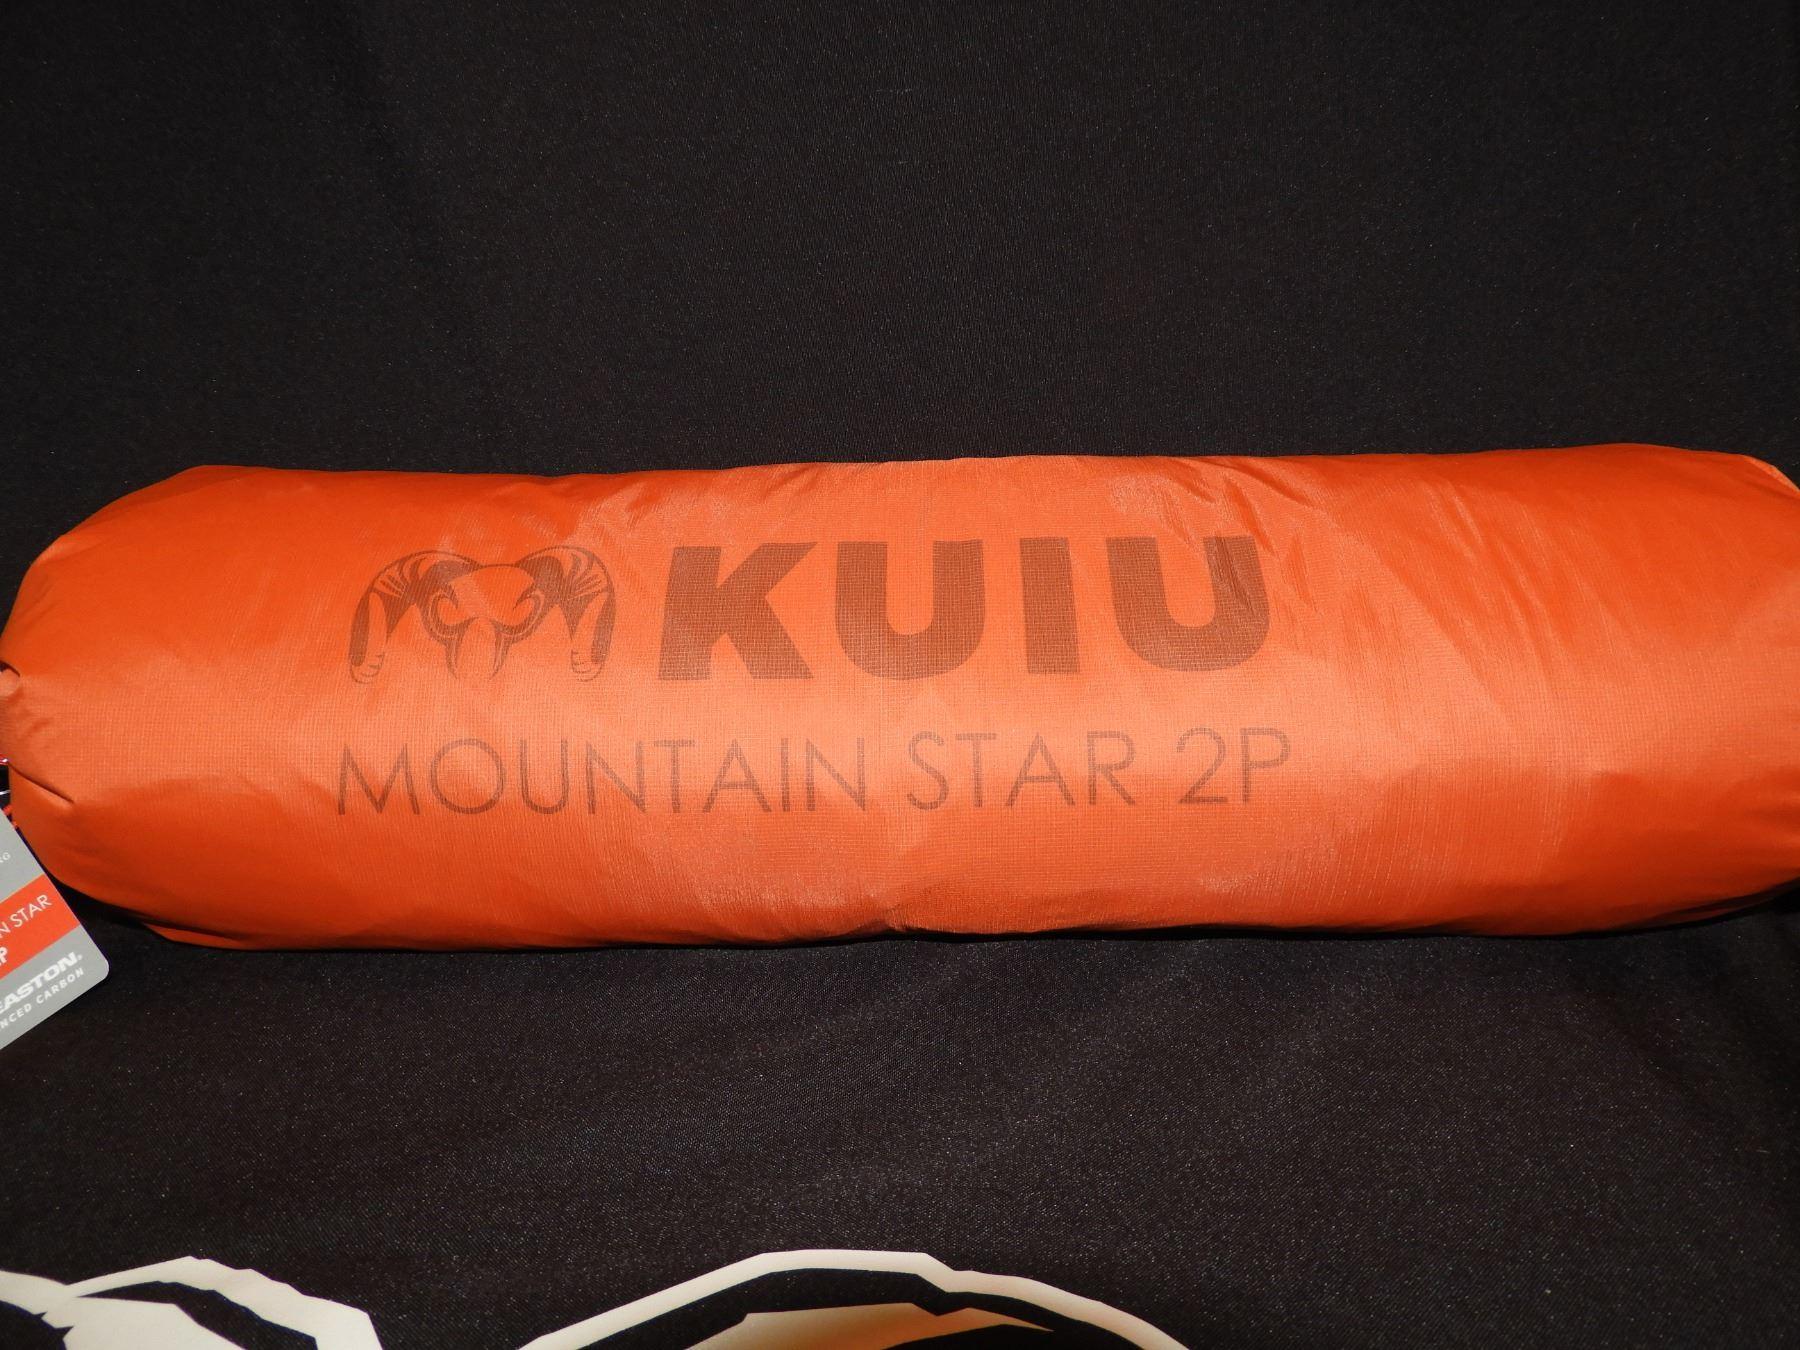 Kuiu Mountain Star 2 Person Tent